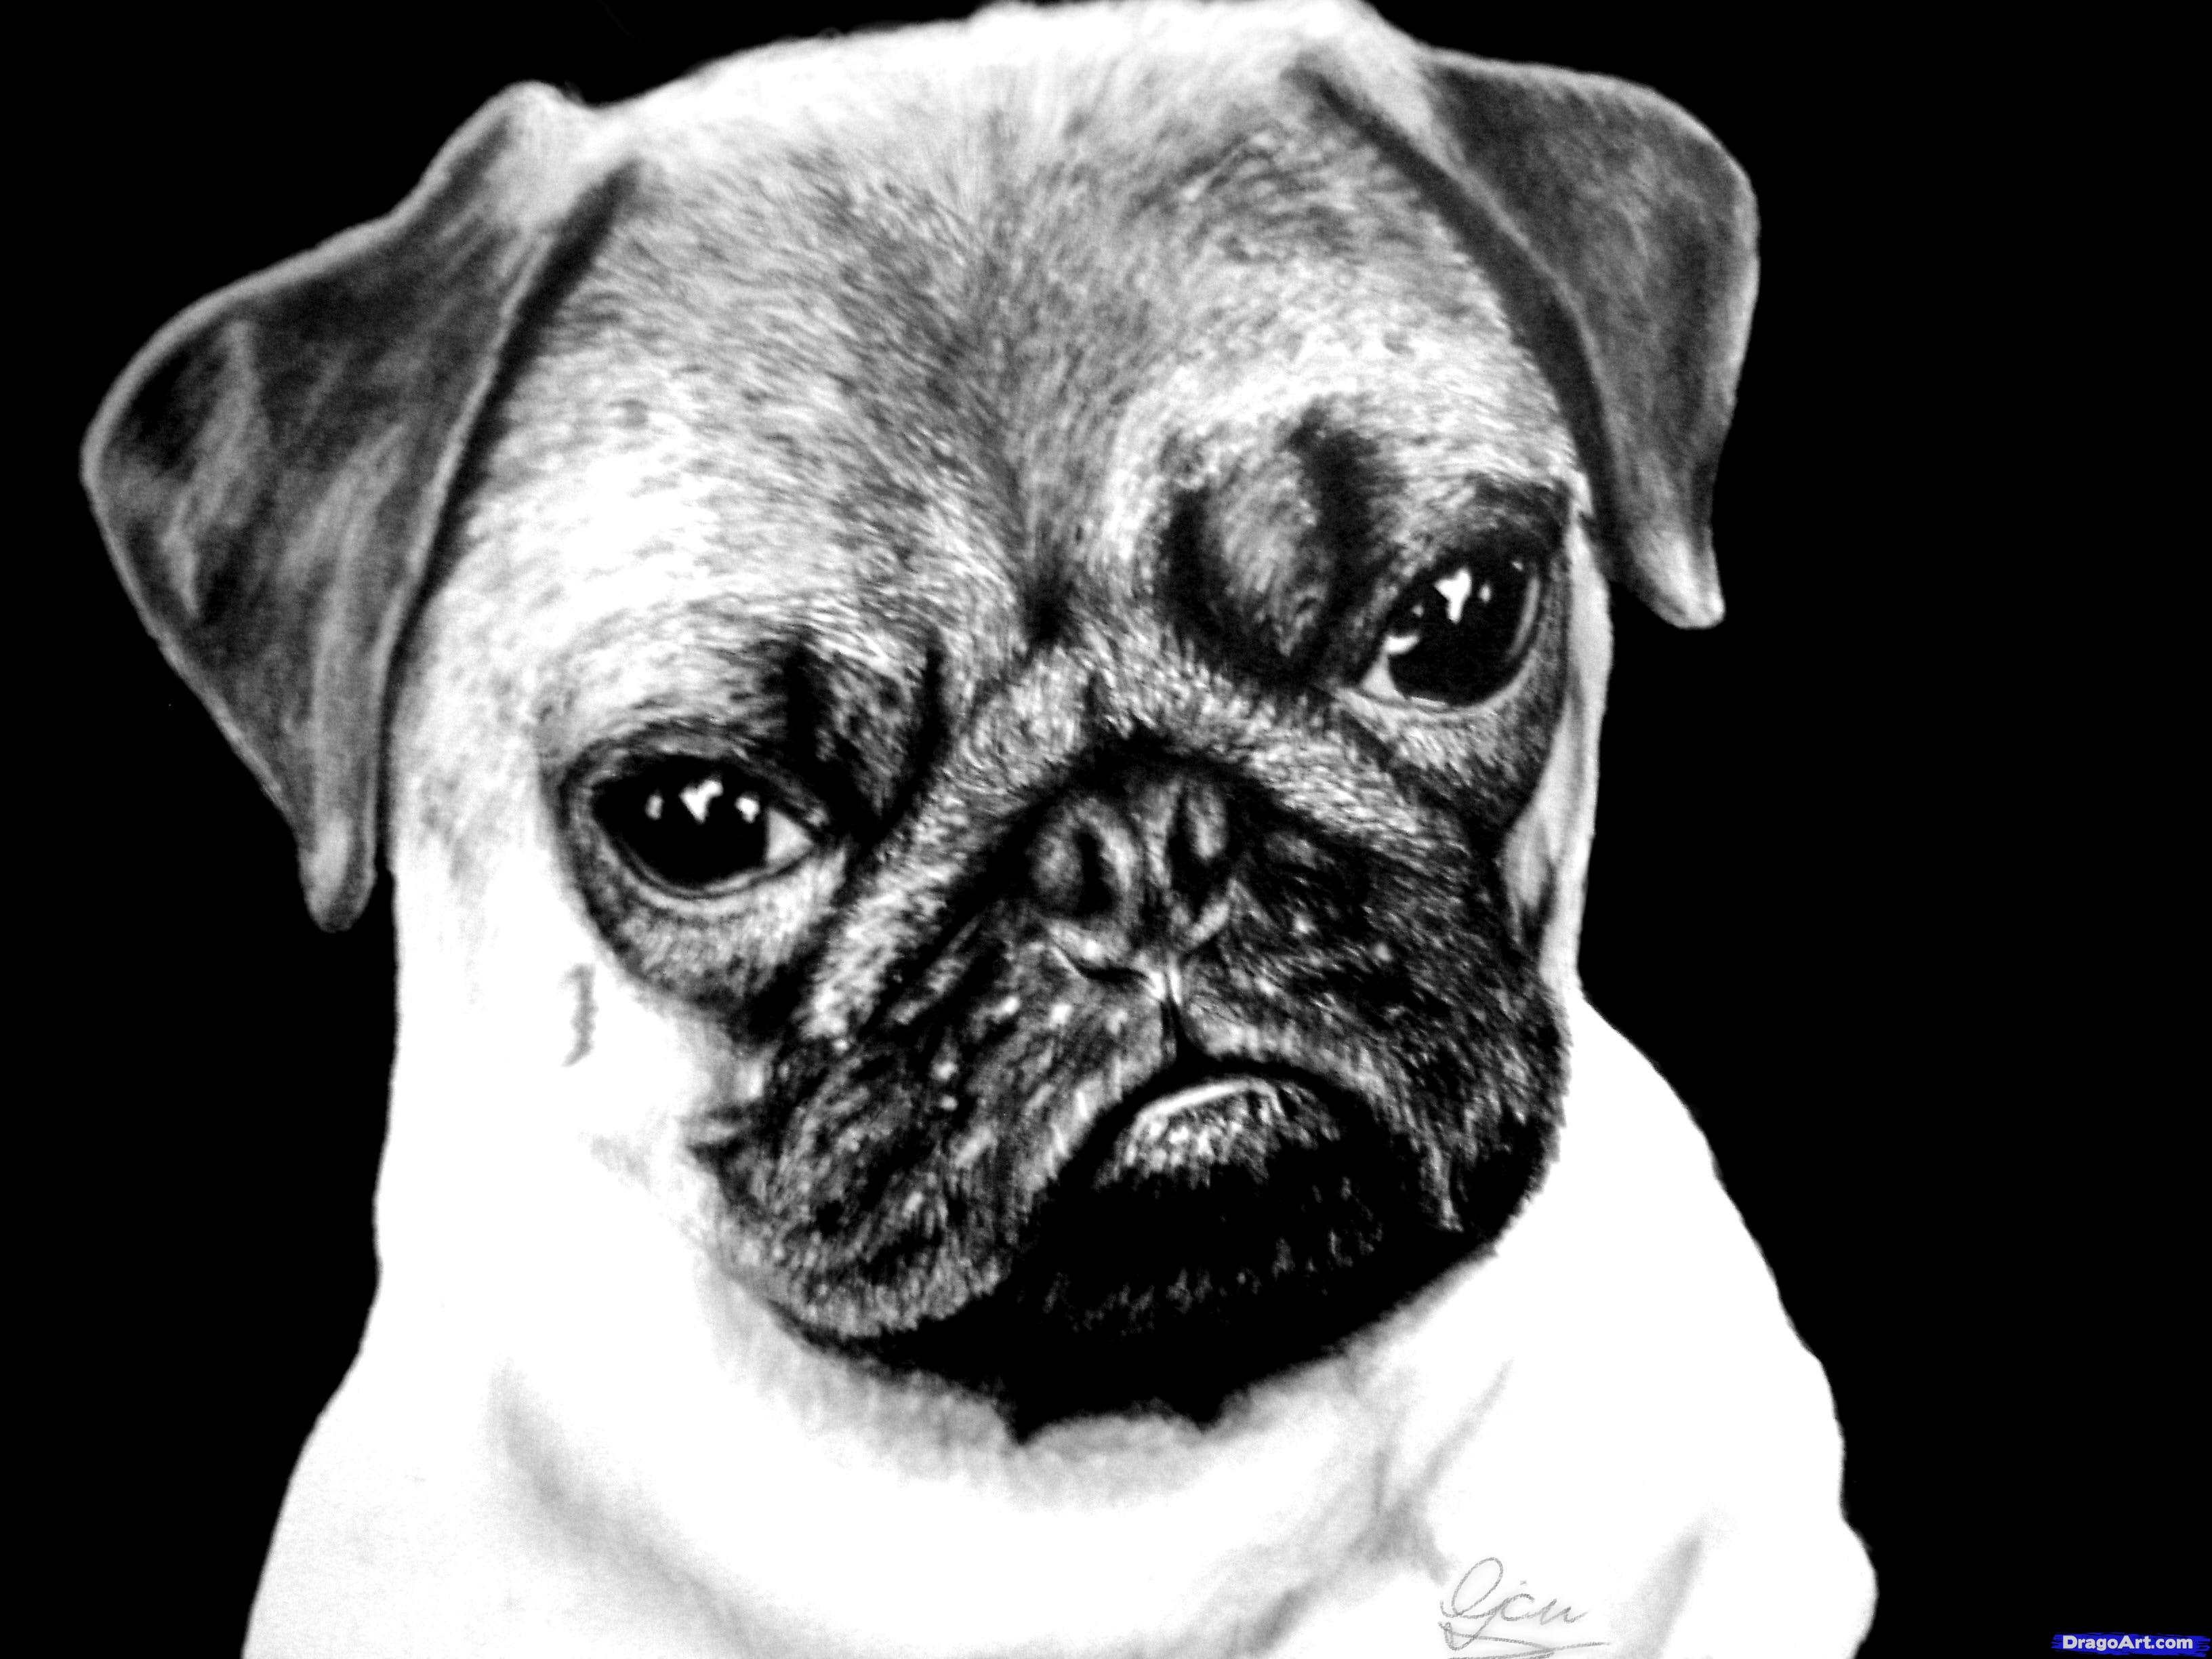 Drawn pug head Step  Animals image by